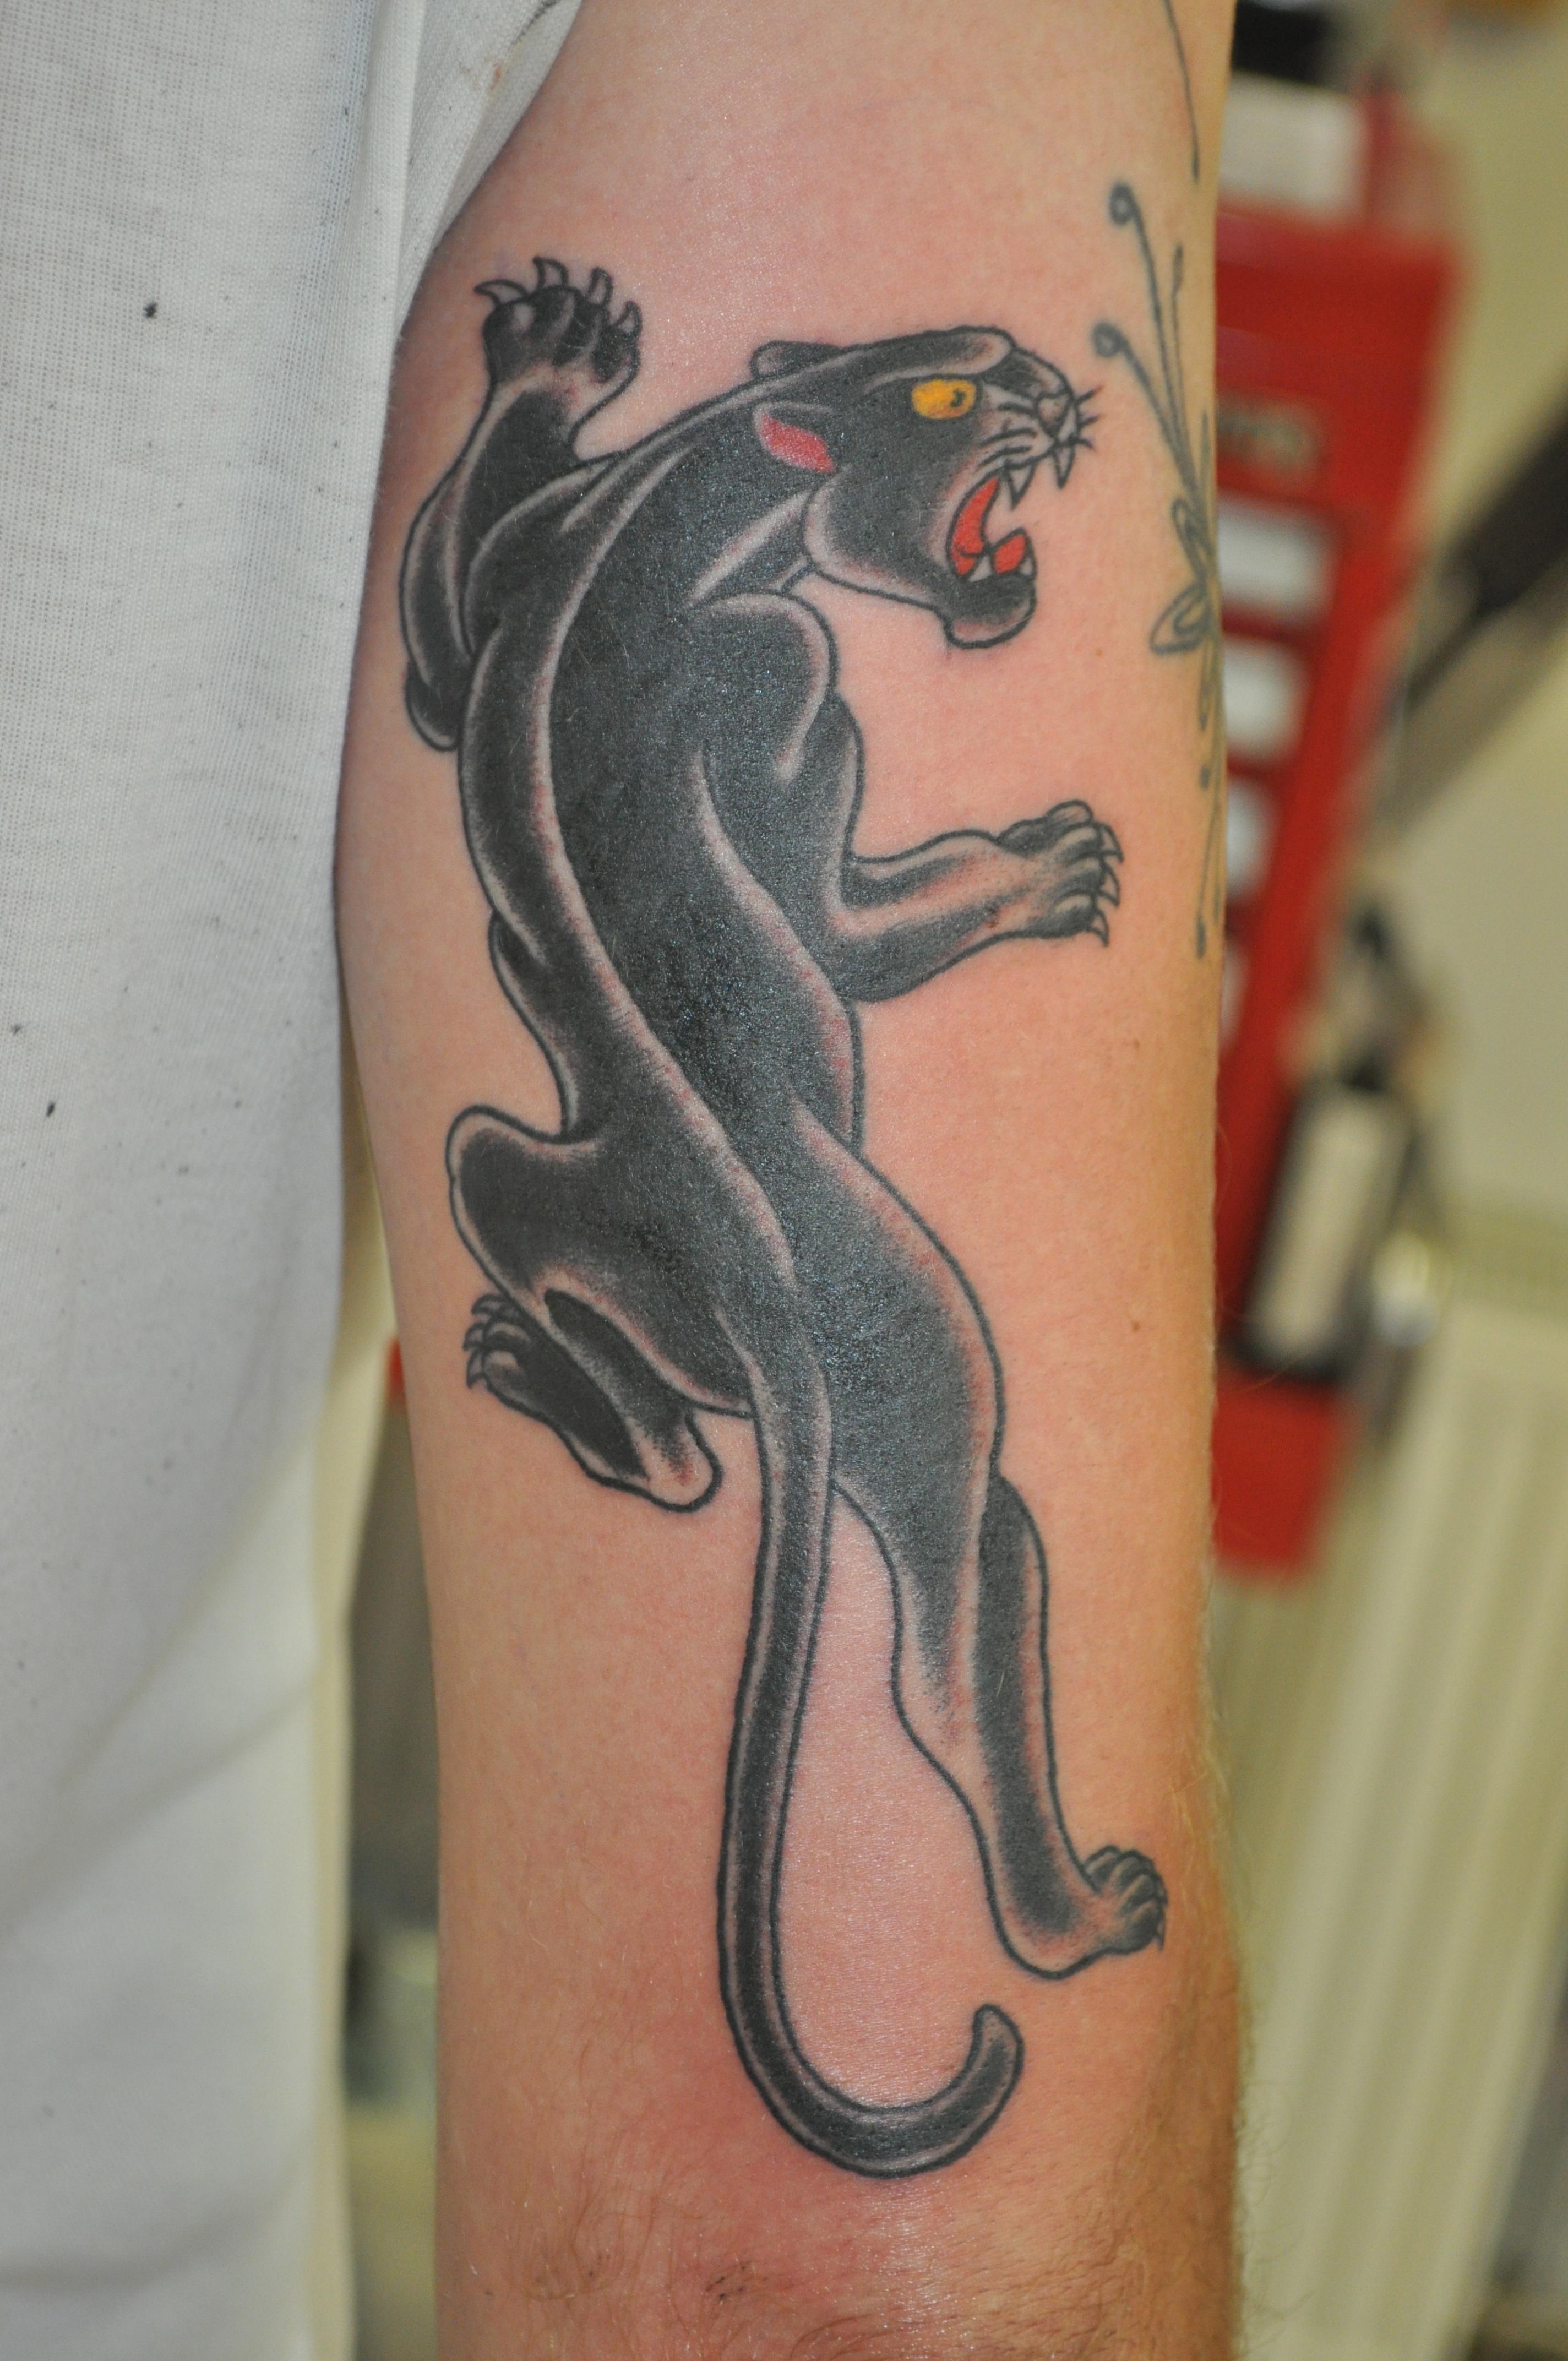 Danny Boy Sawyer, Daniel Sawyer, Rose Tattoo Amsterdam, Traditional tattoo, americana tattoo, anchor tattoo, amsterdam tattoo shop, classic tattoo, traditional, panther tattoo